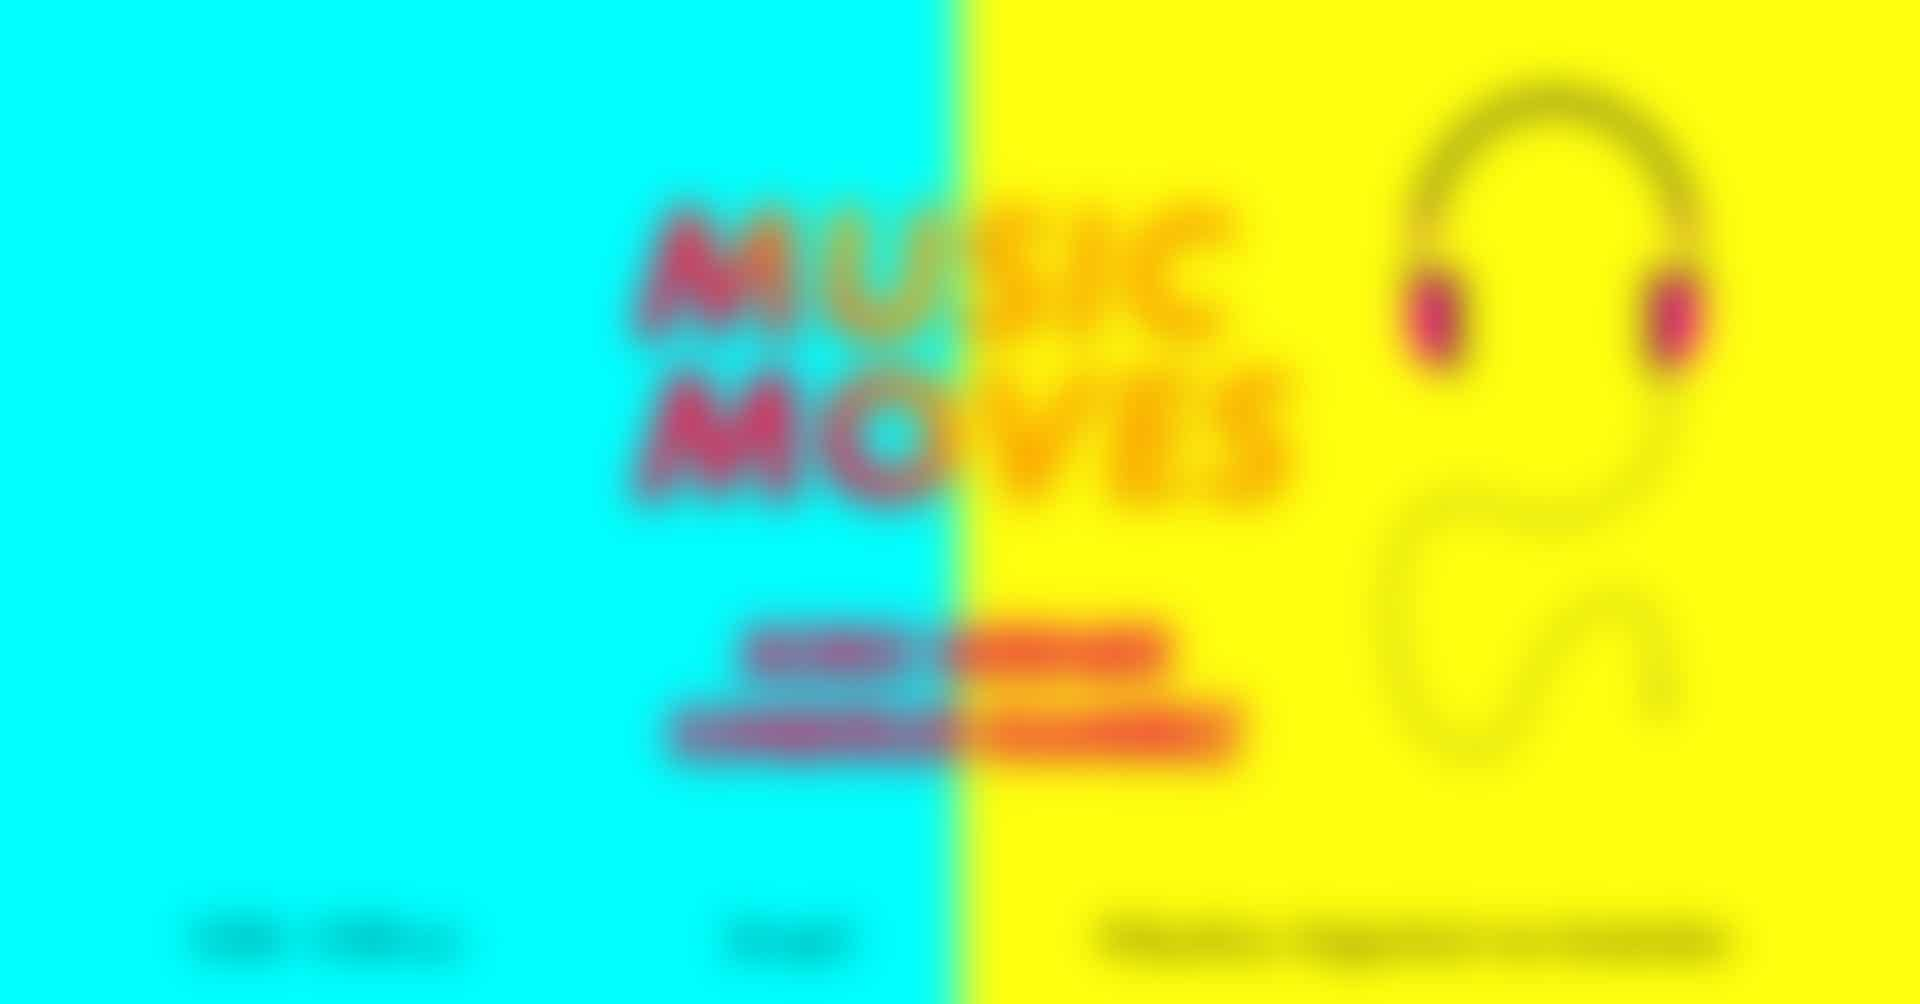 Silent Disco in de HvA: Boris Werner & Kimberlee-Ramirez | Music Moves